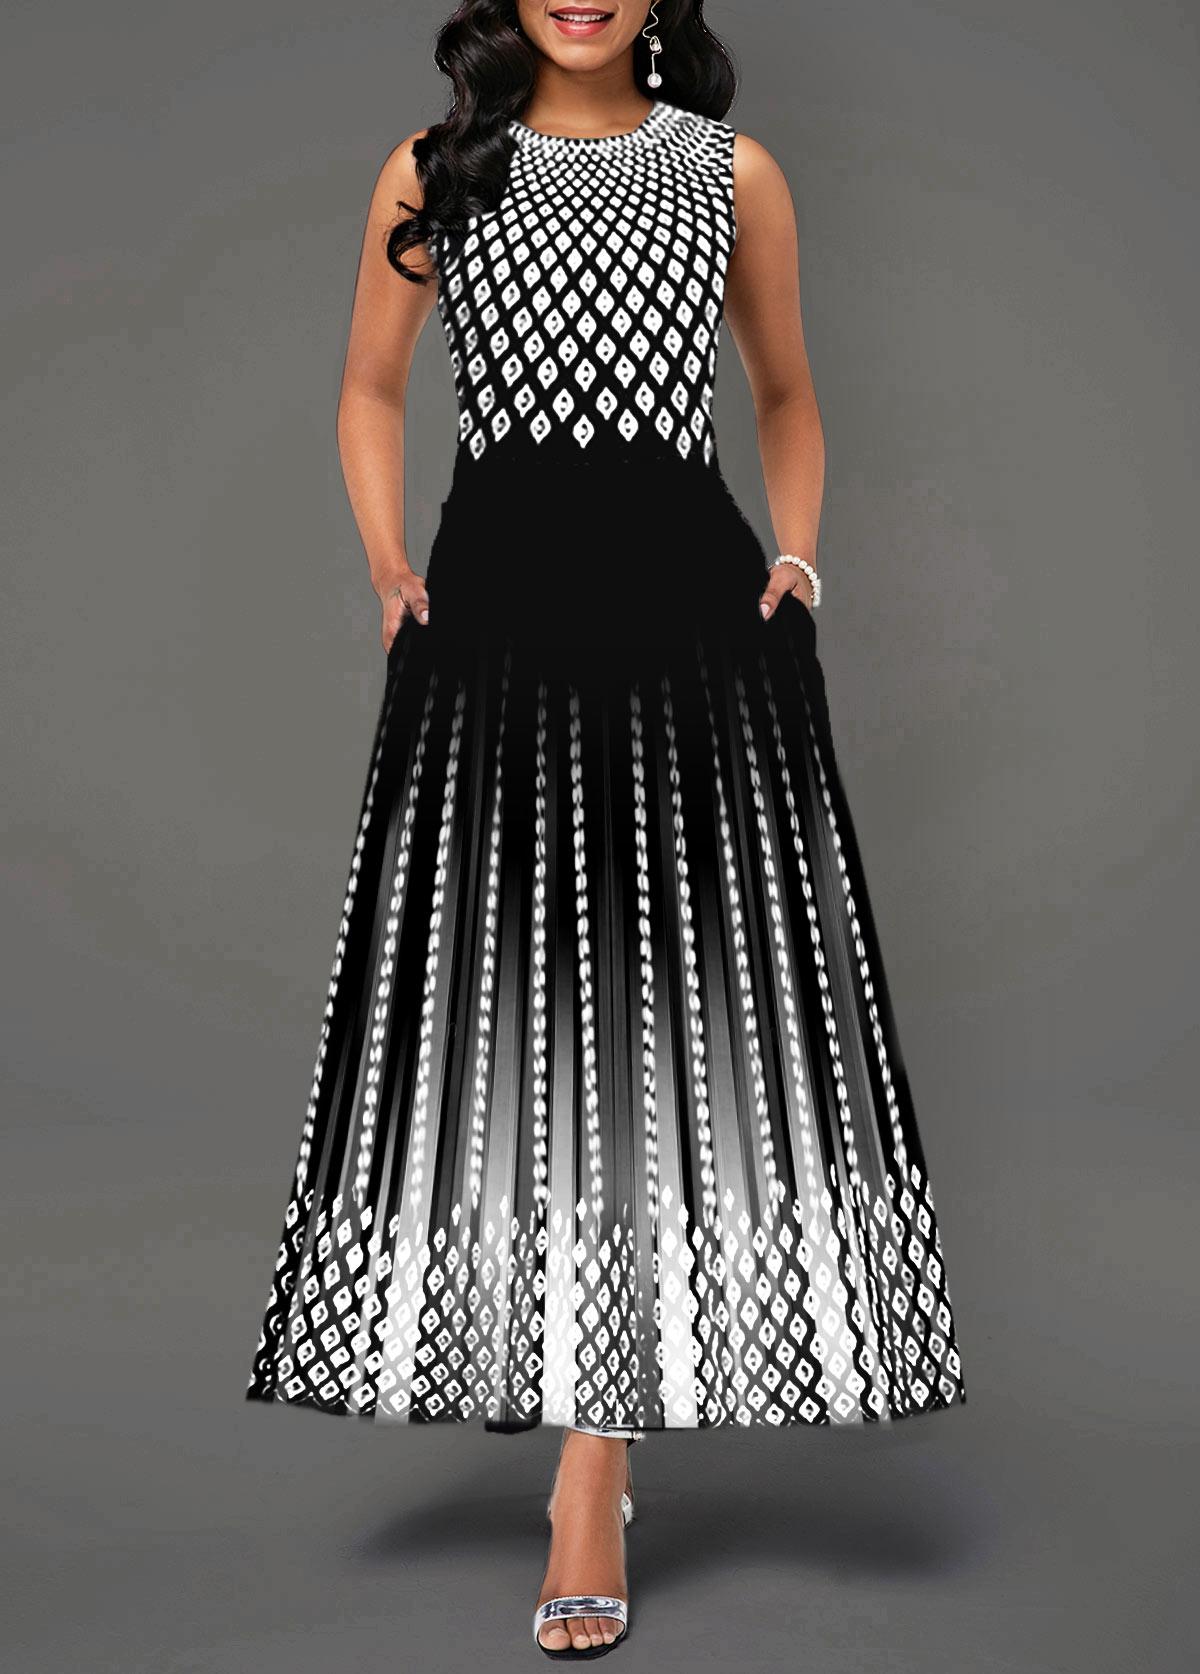 Round Neck High Waist Sleeveless Dress